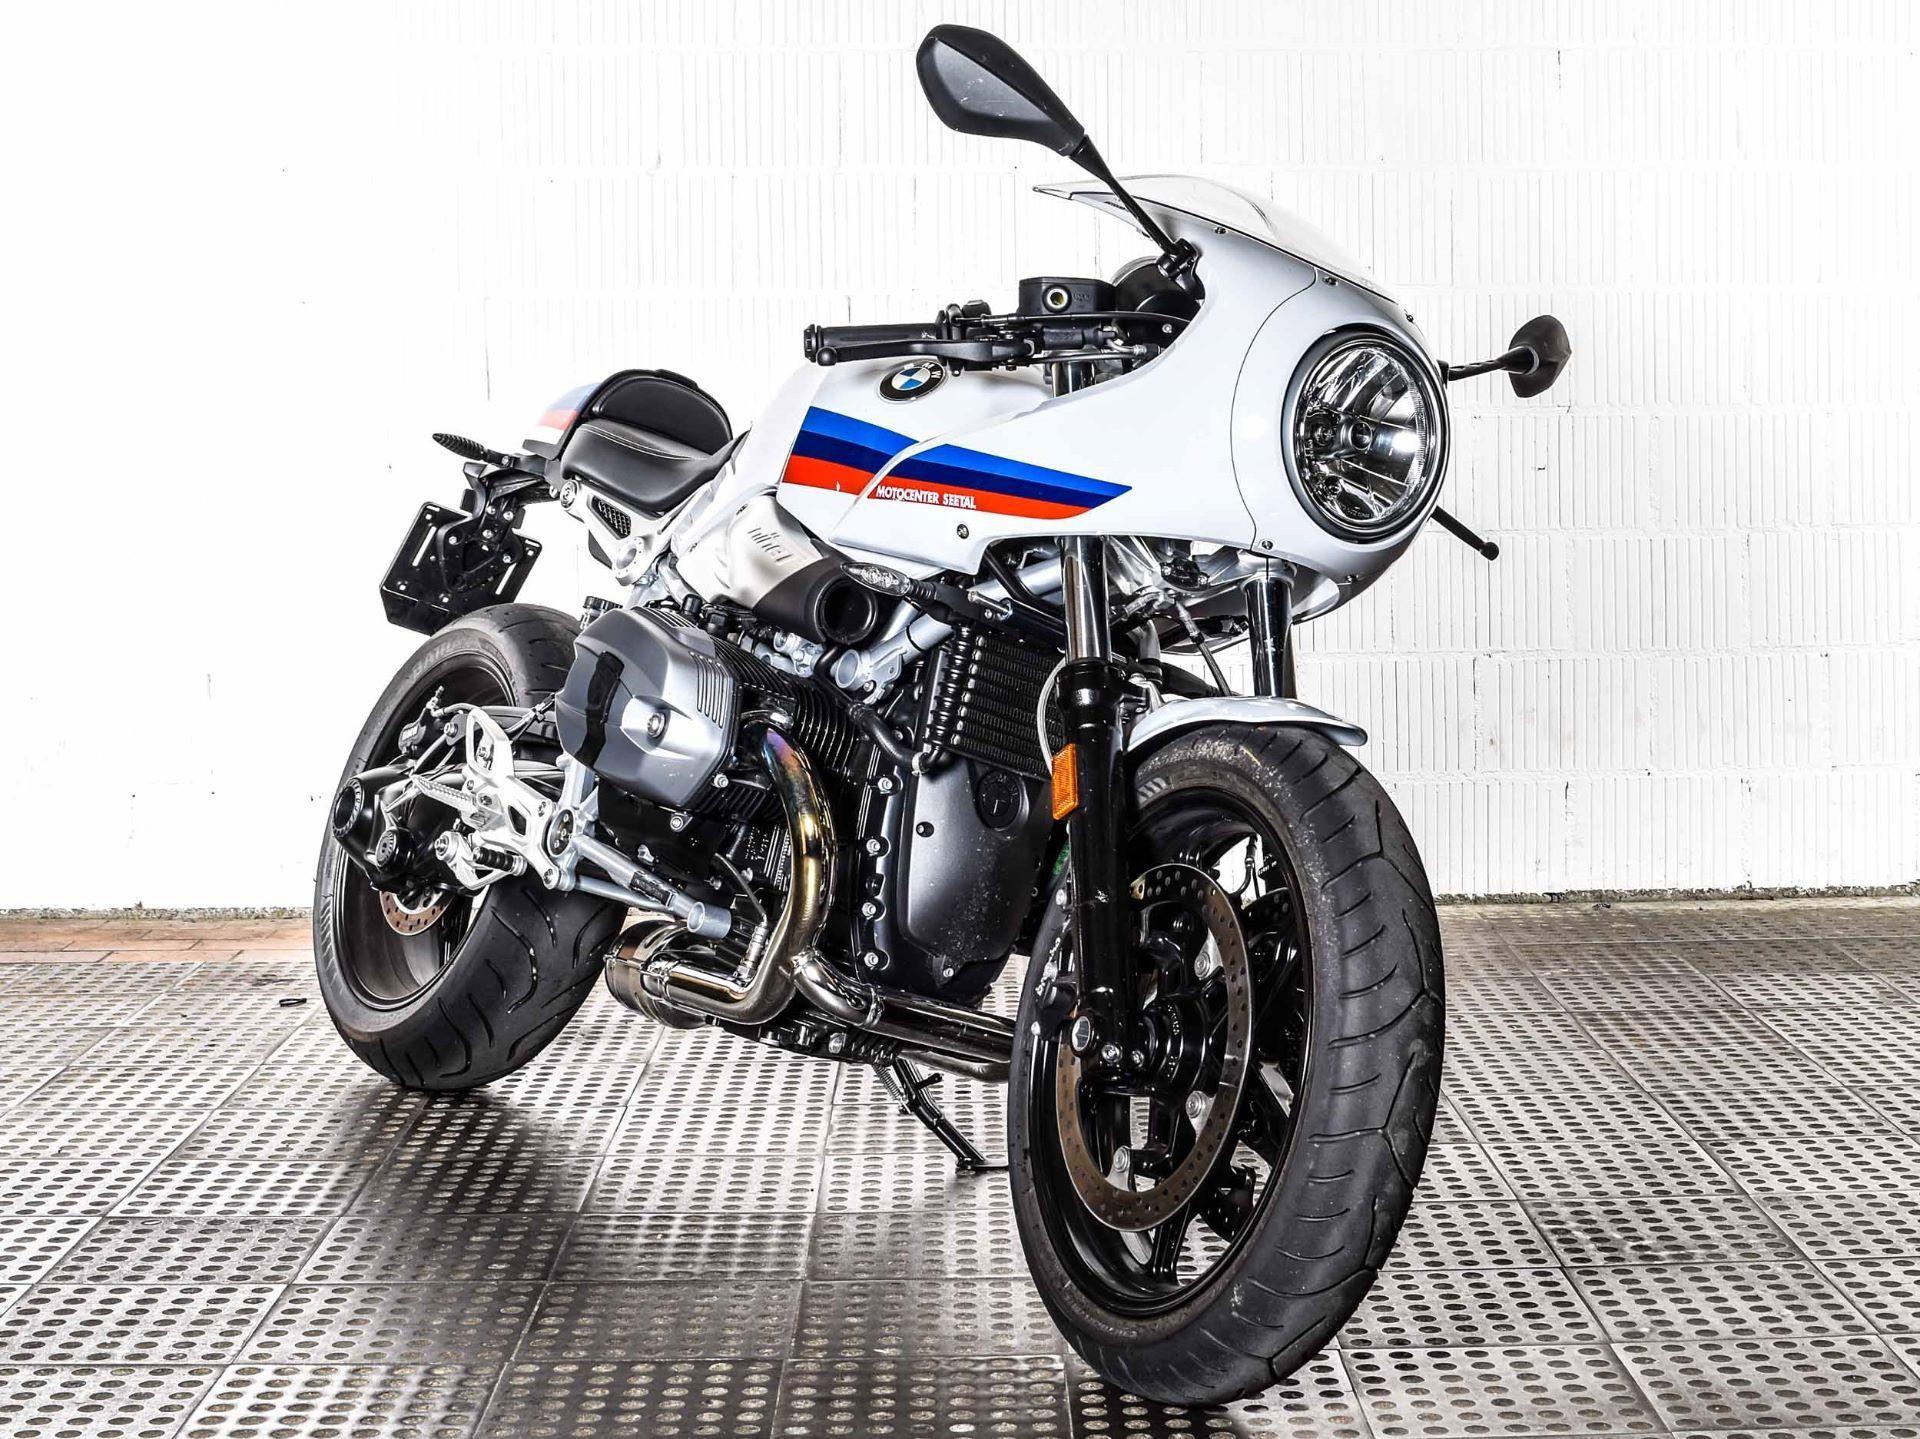 moto occasions acheter bmw r nine t racer abs ex demo motocenter seetal hochdorf. Black Bedroom Furniture Sets. Home Design Ideas